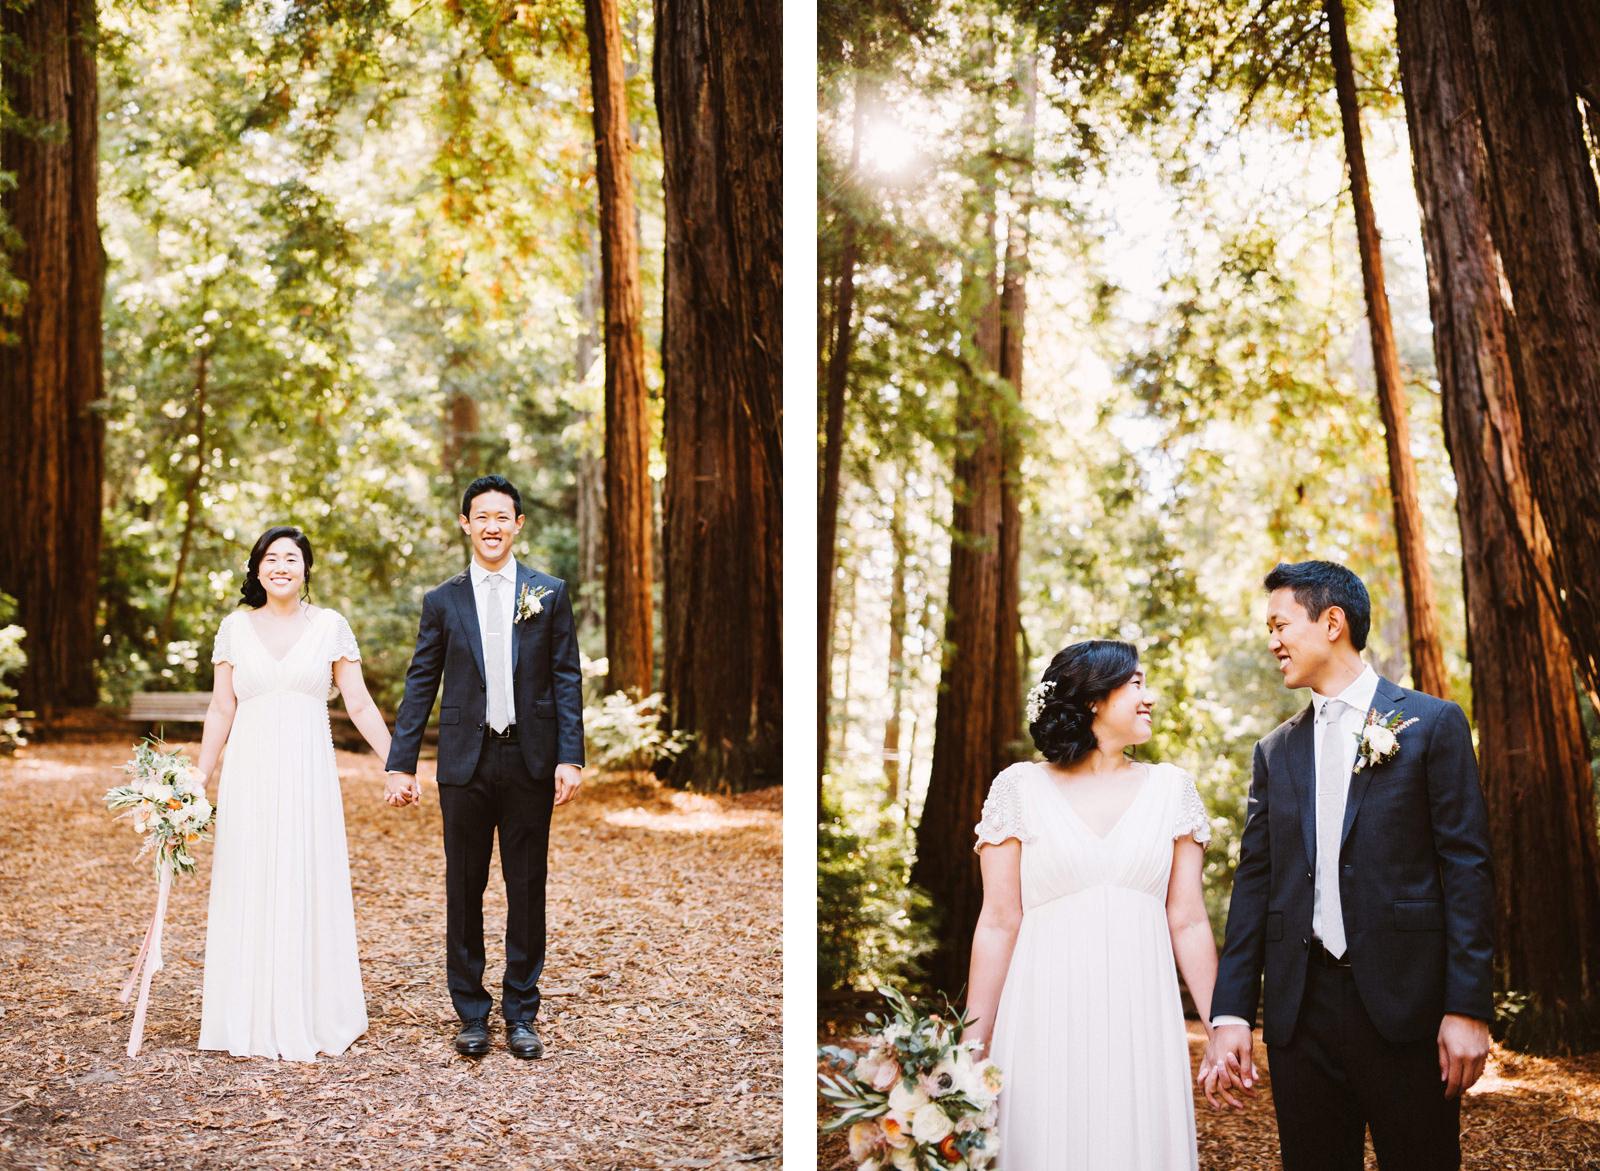 kimclay-blog-008 REDWOOD FOREST WEDDING